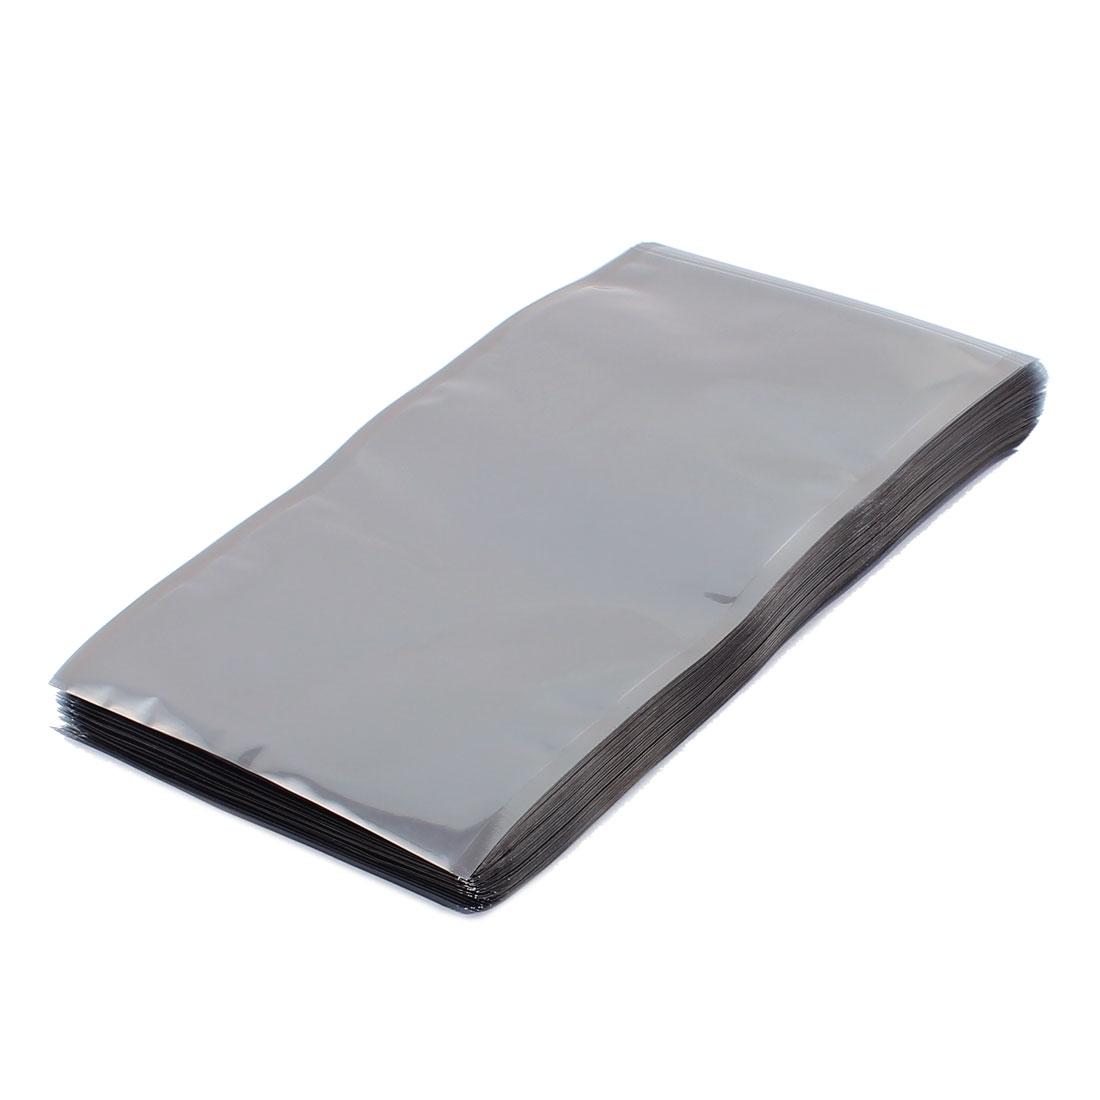 100 Pcs 110mm x 200mm Silver Tone Flat Open Top Anti Static Bag For Electronics